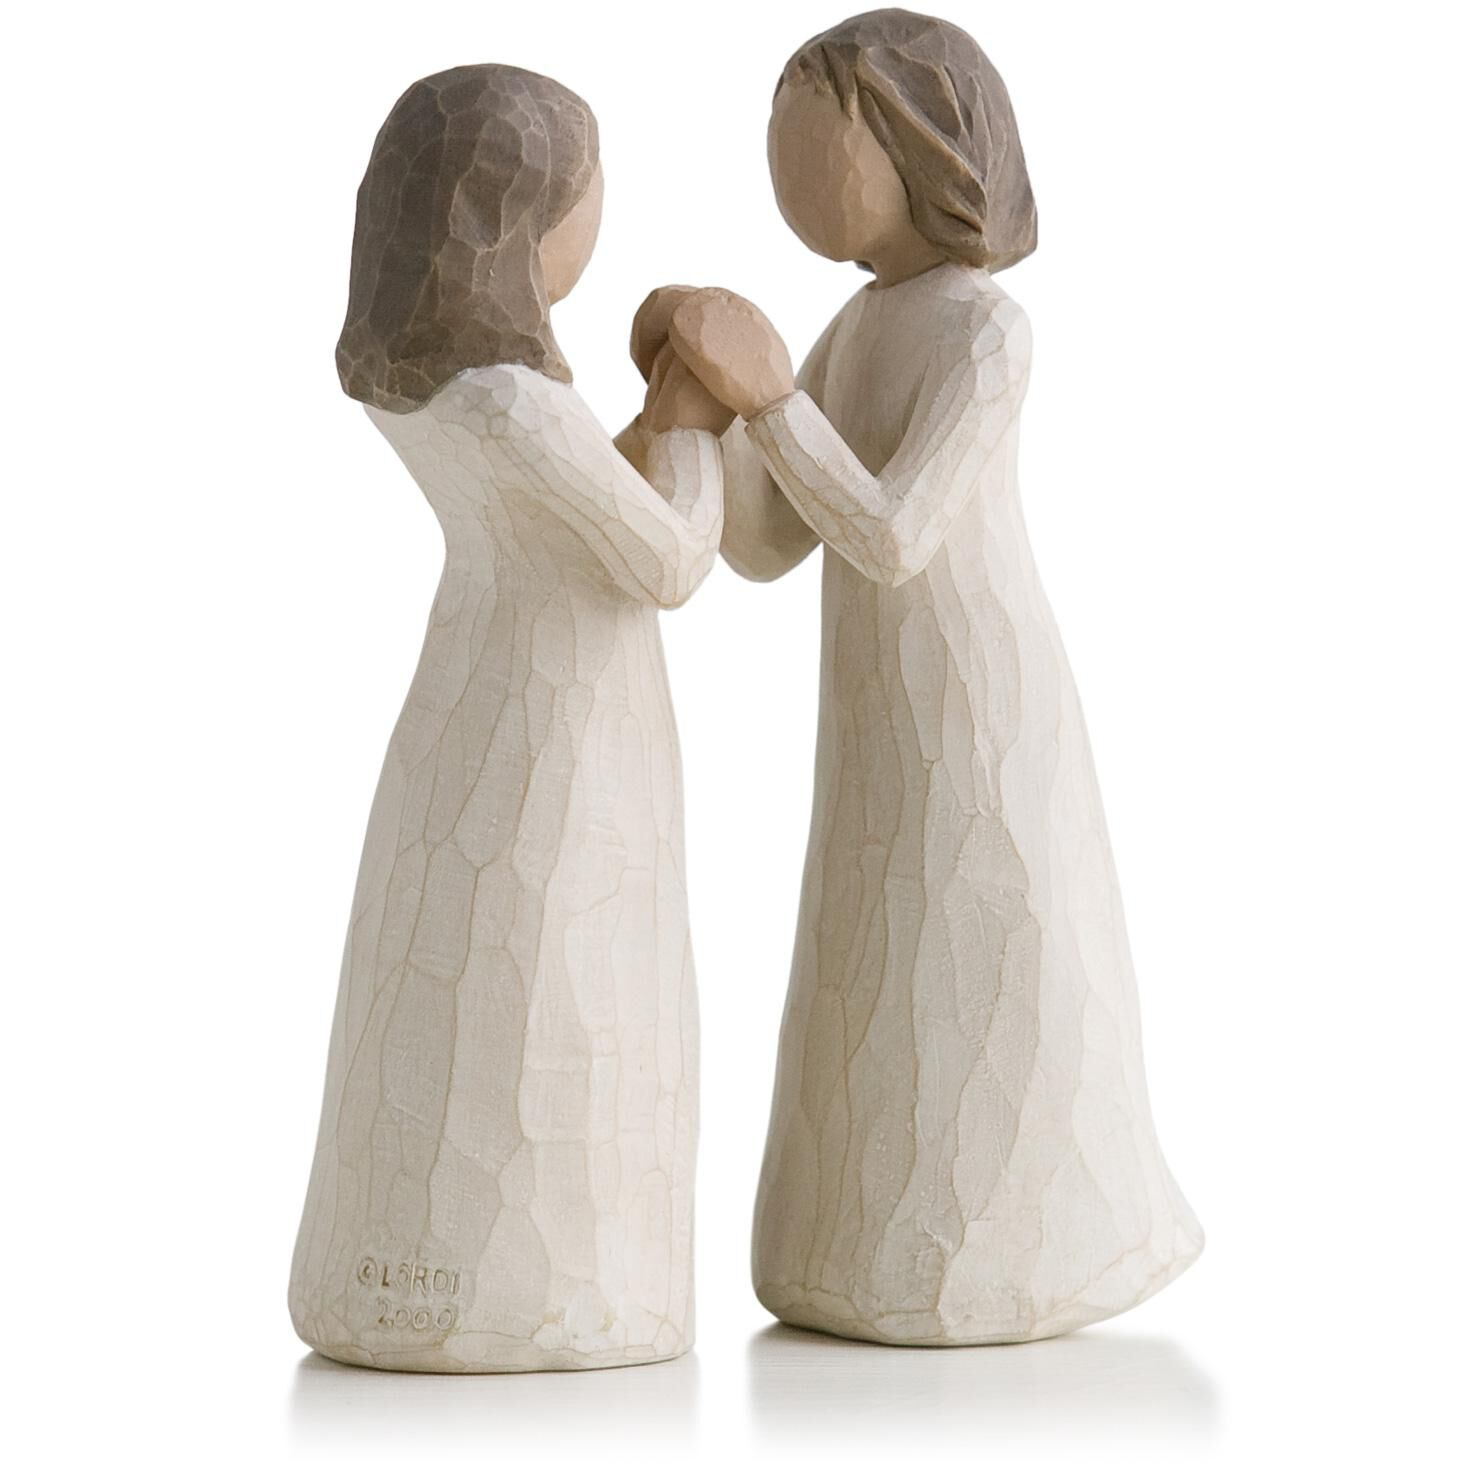 willow tree sisters by heart figurine figurines hallmark. Black Bedroom Furniture Sets. Home Design Ideas